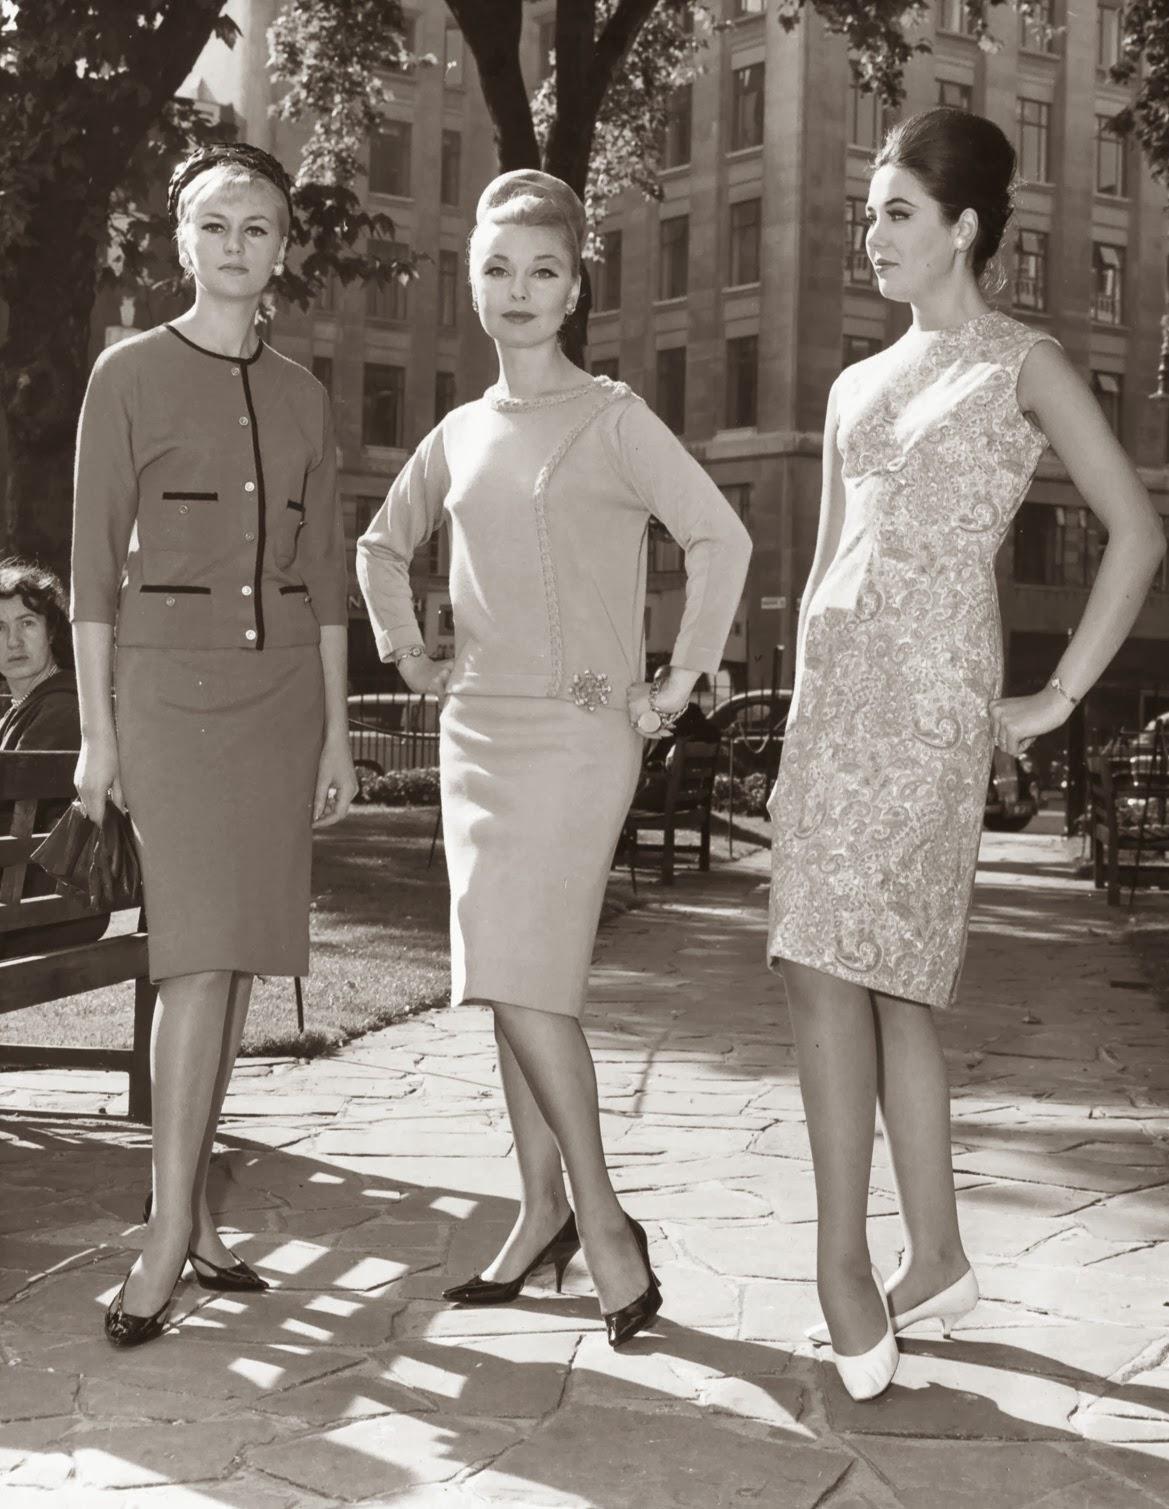 London Fashion 1962 Vintage Everyday